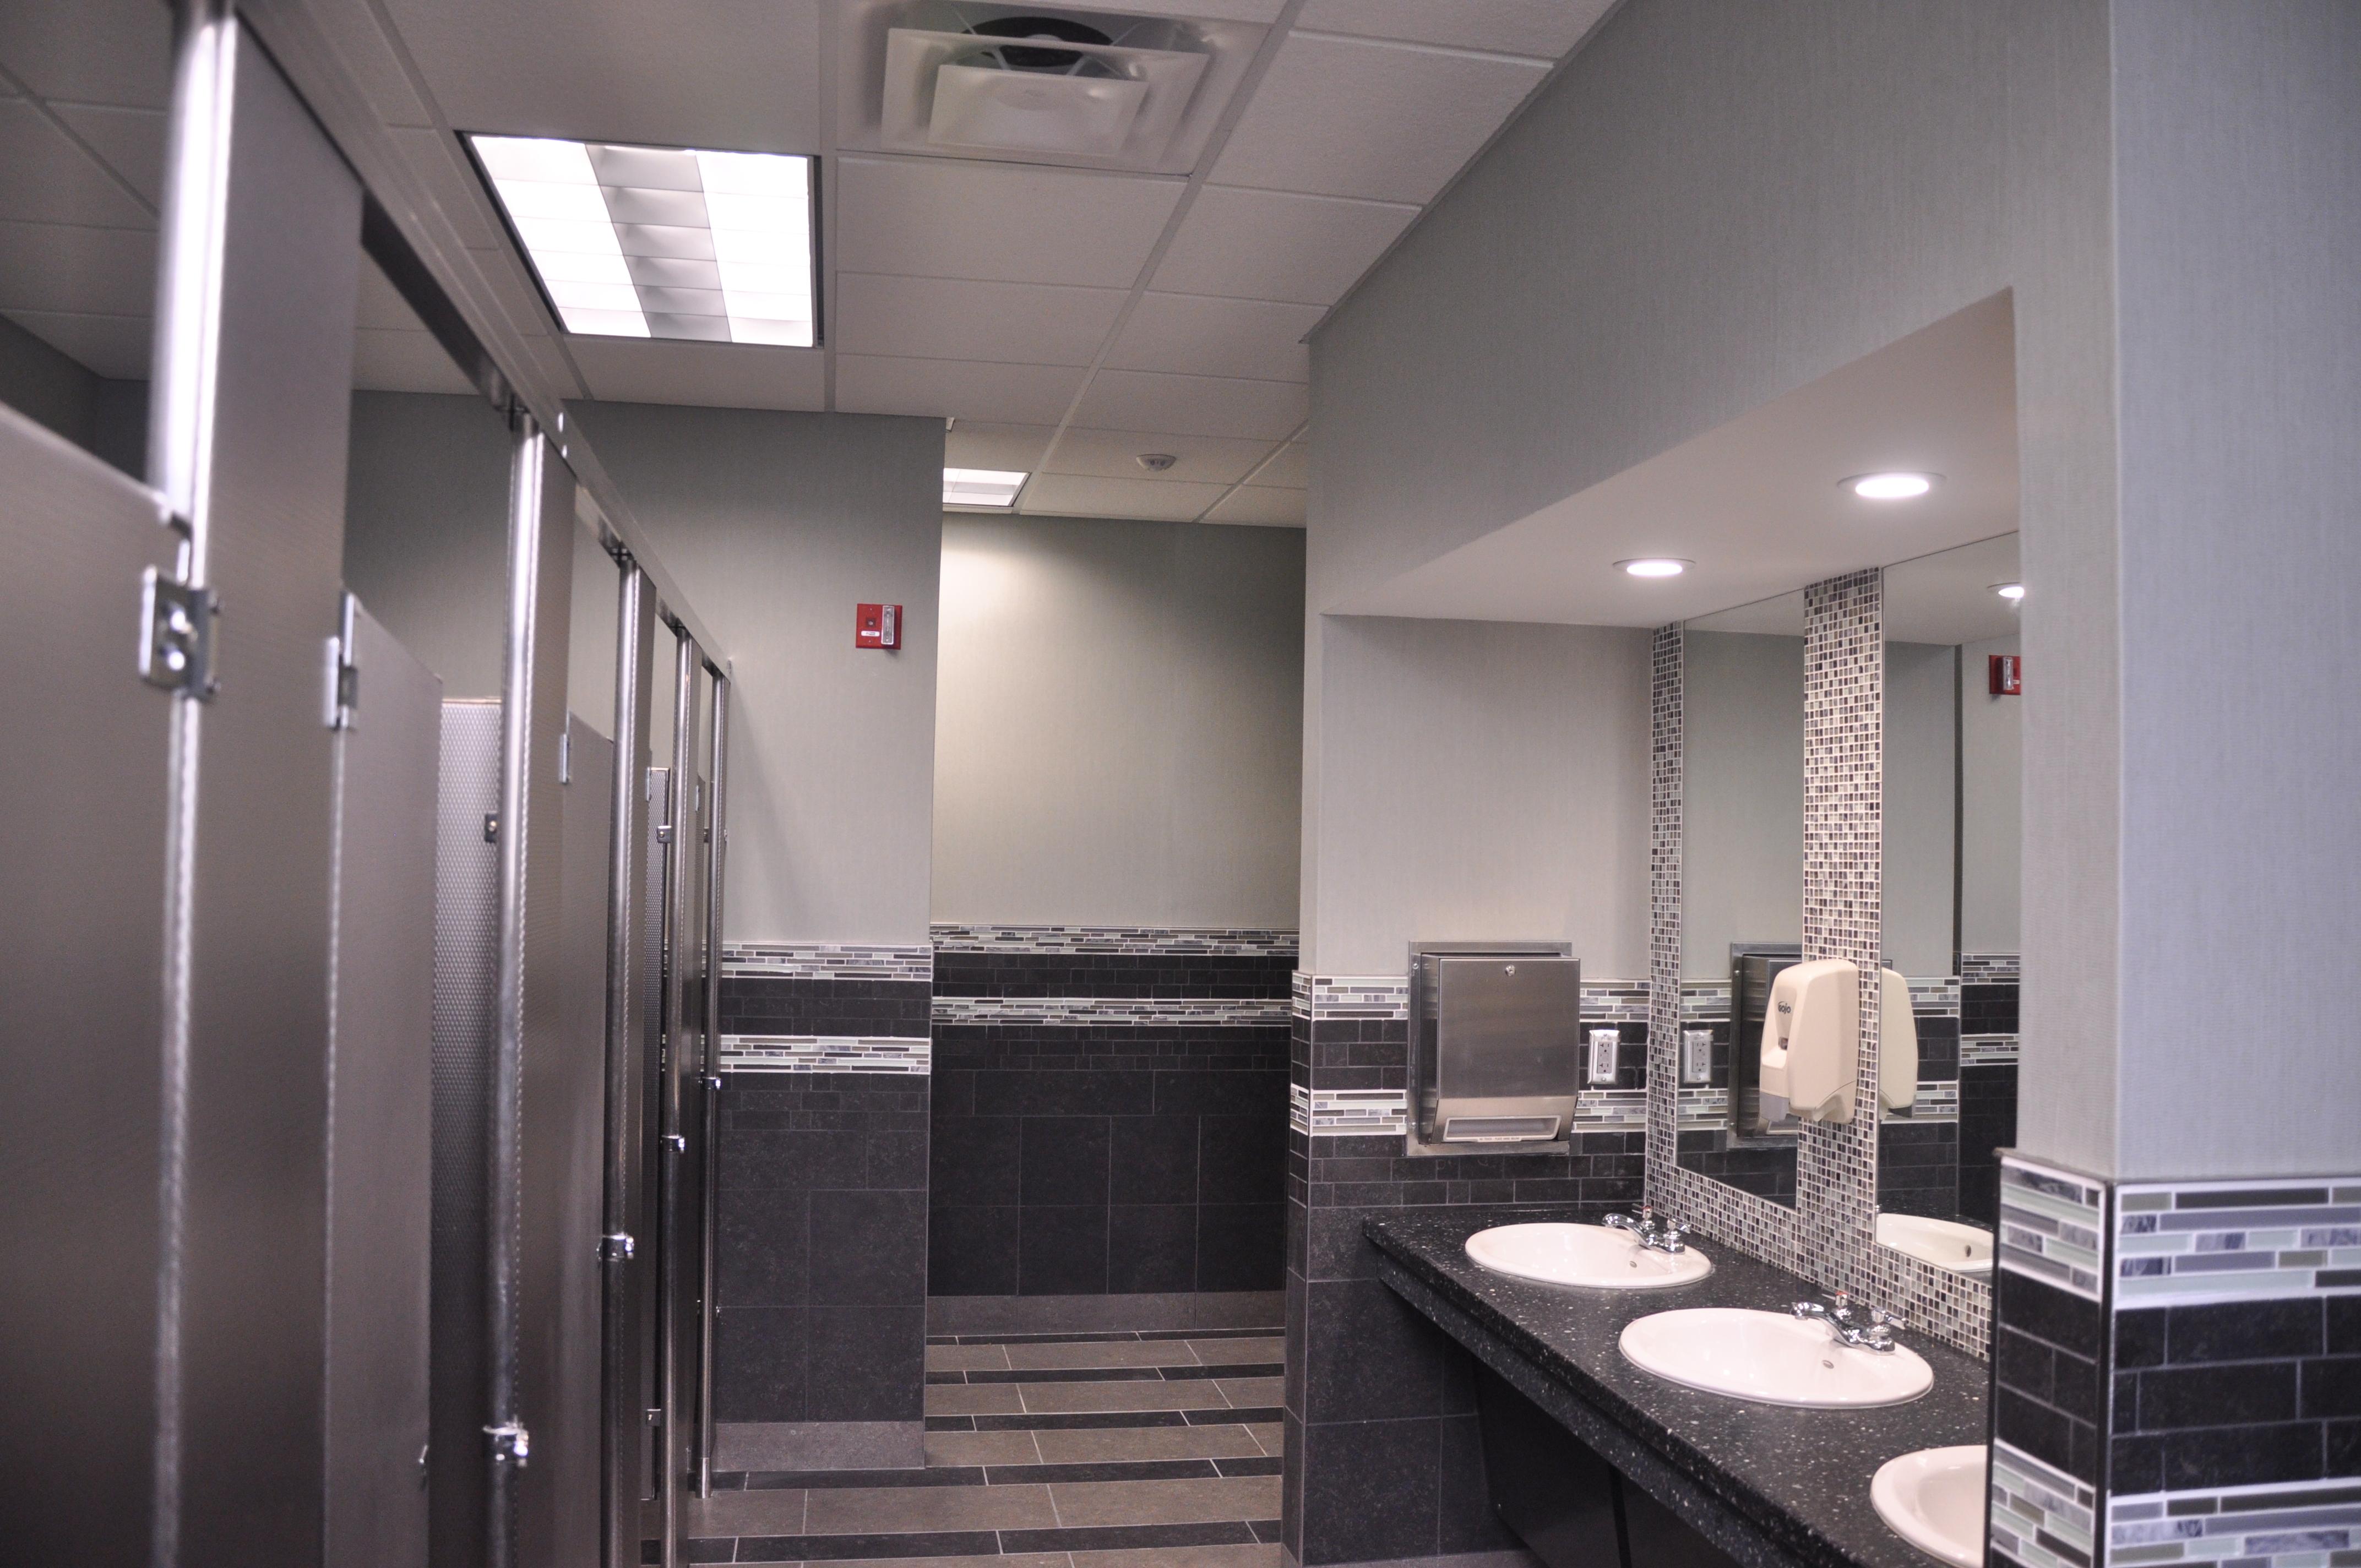 CAIR Restroom Remodel